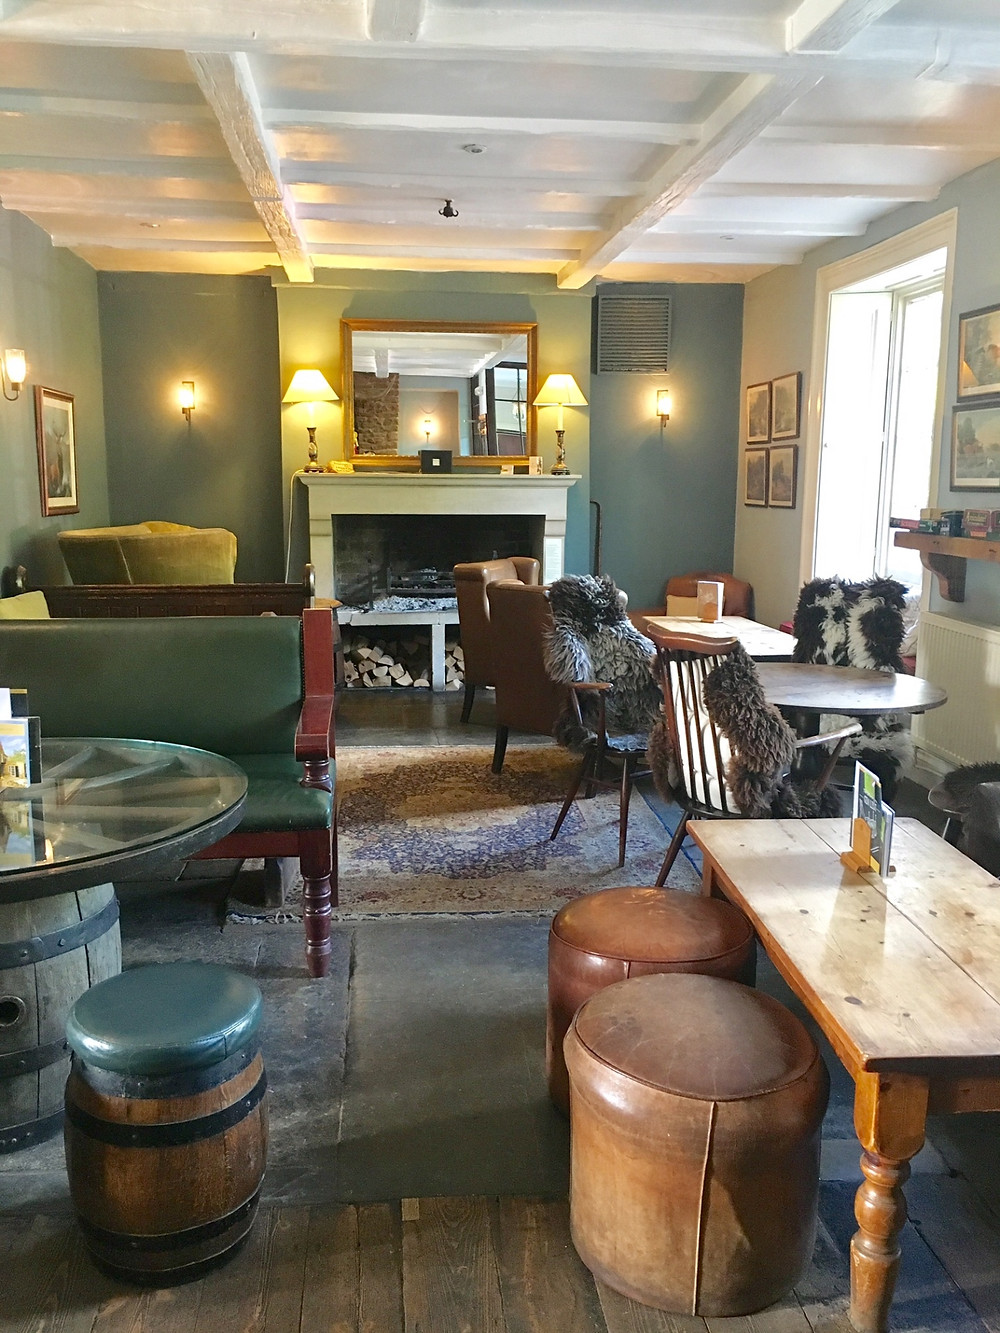 Somerset cool, Queens Arms Corton Denham, Somerset pubs, Somerset cool, Somerset bloggers